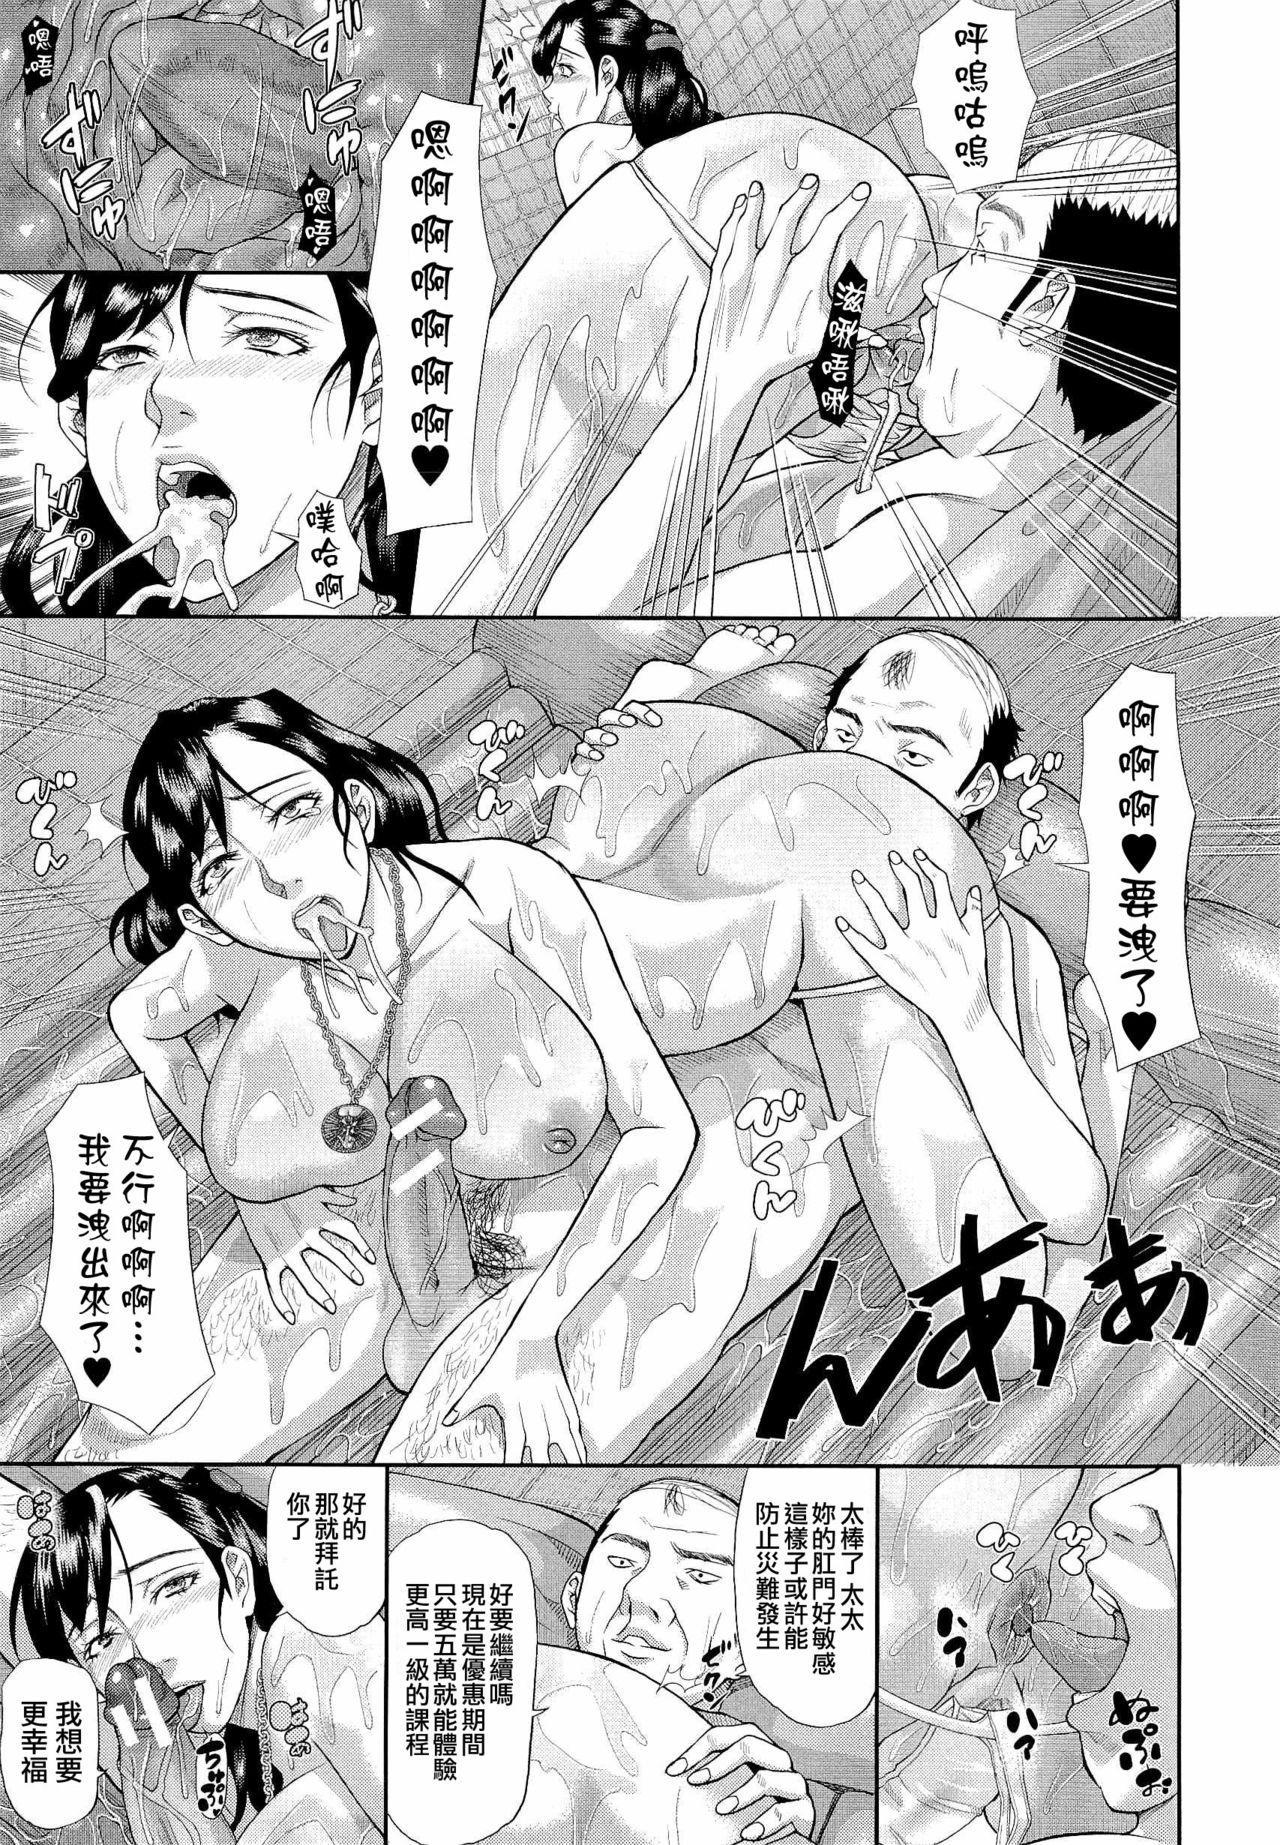 [Honebuto Danshaku] Innou Kaizou Program ~Oyako Zecchou Cult Ochi~ [Chinese]【不想记名重嵌--高质量图源】 24